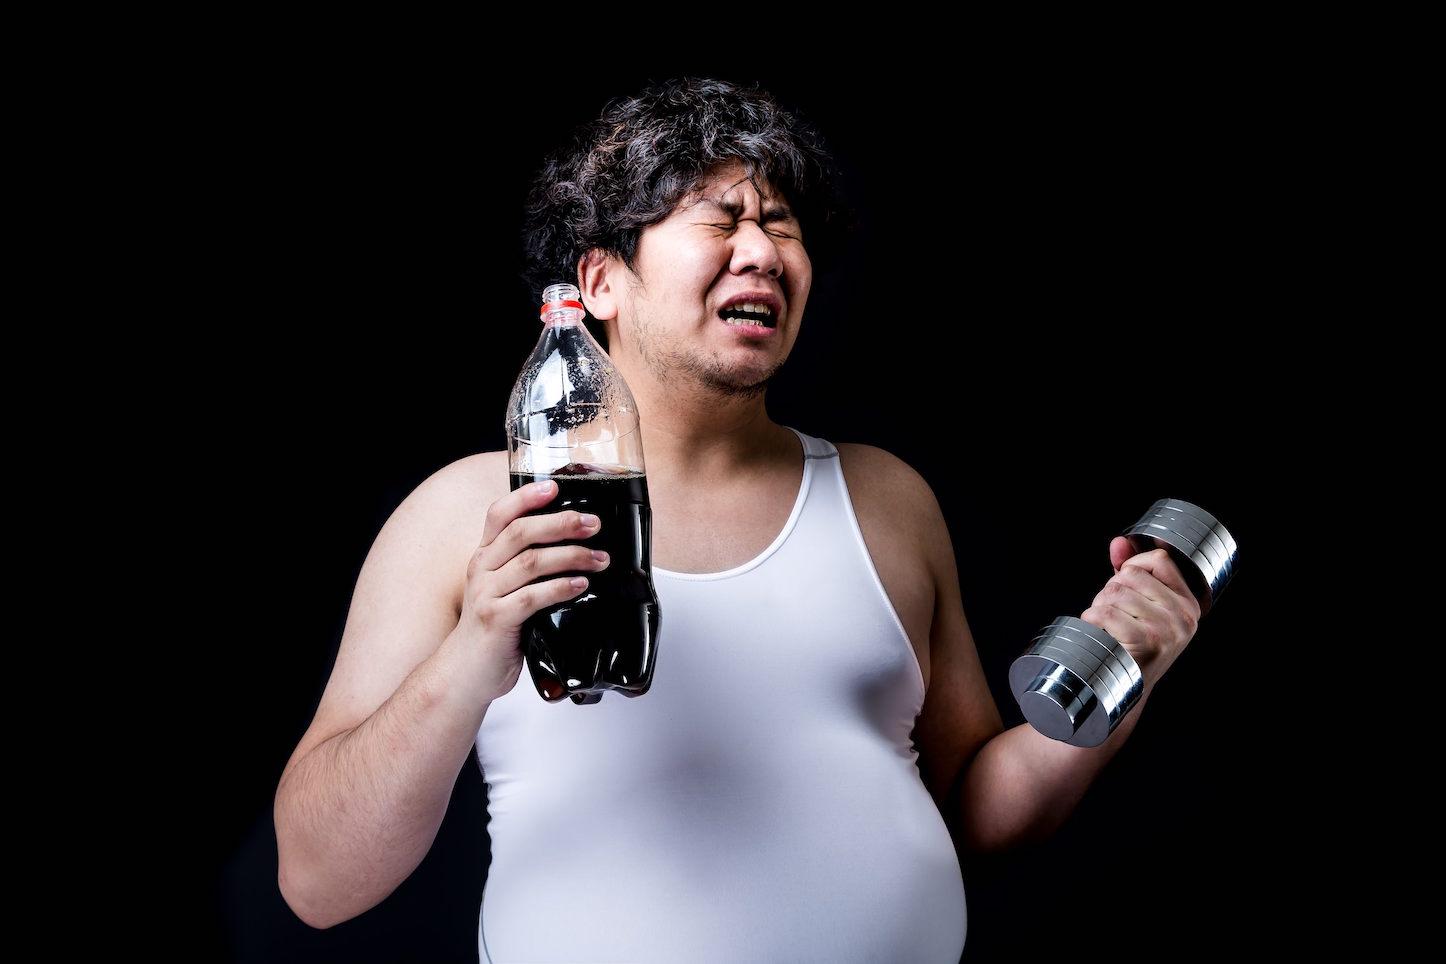 Diet cola training